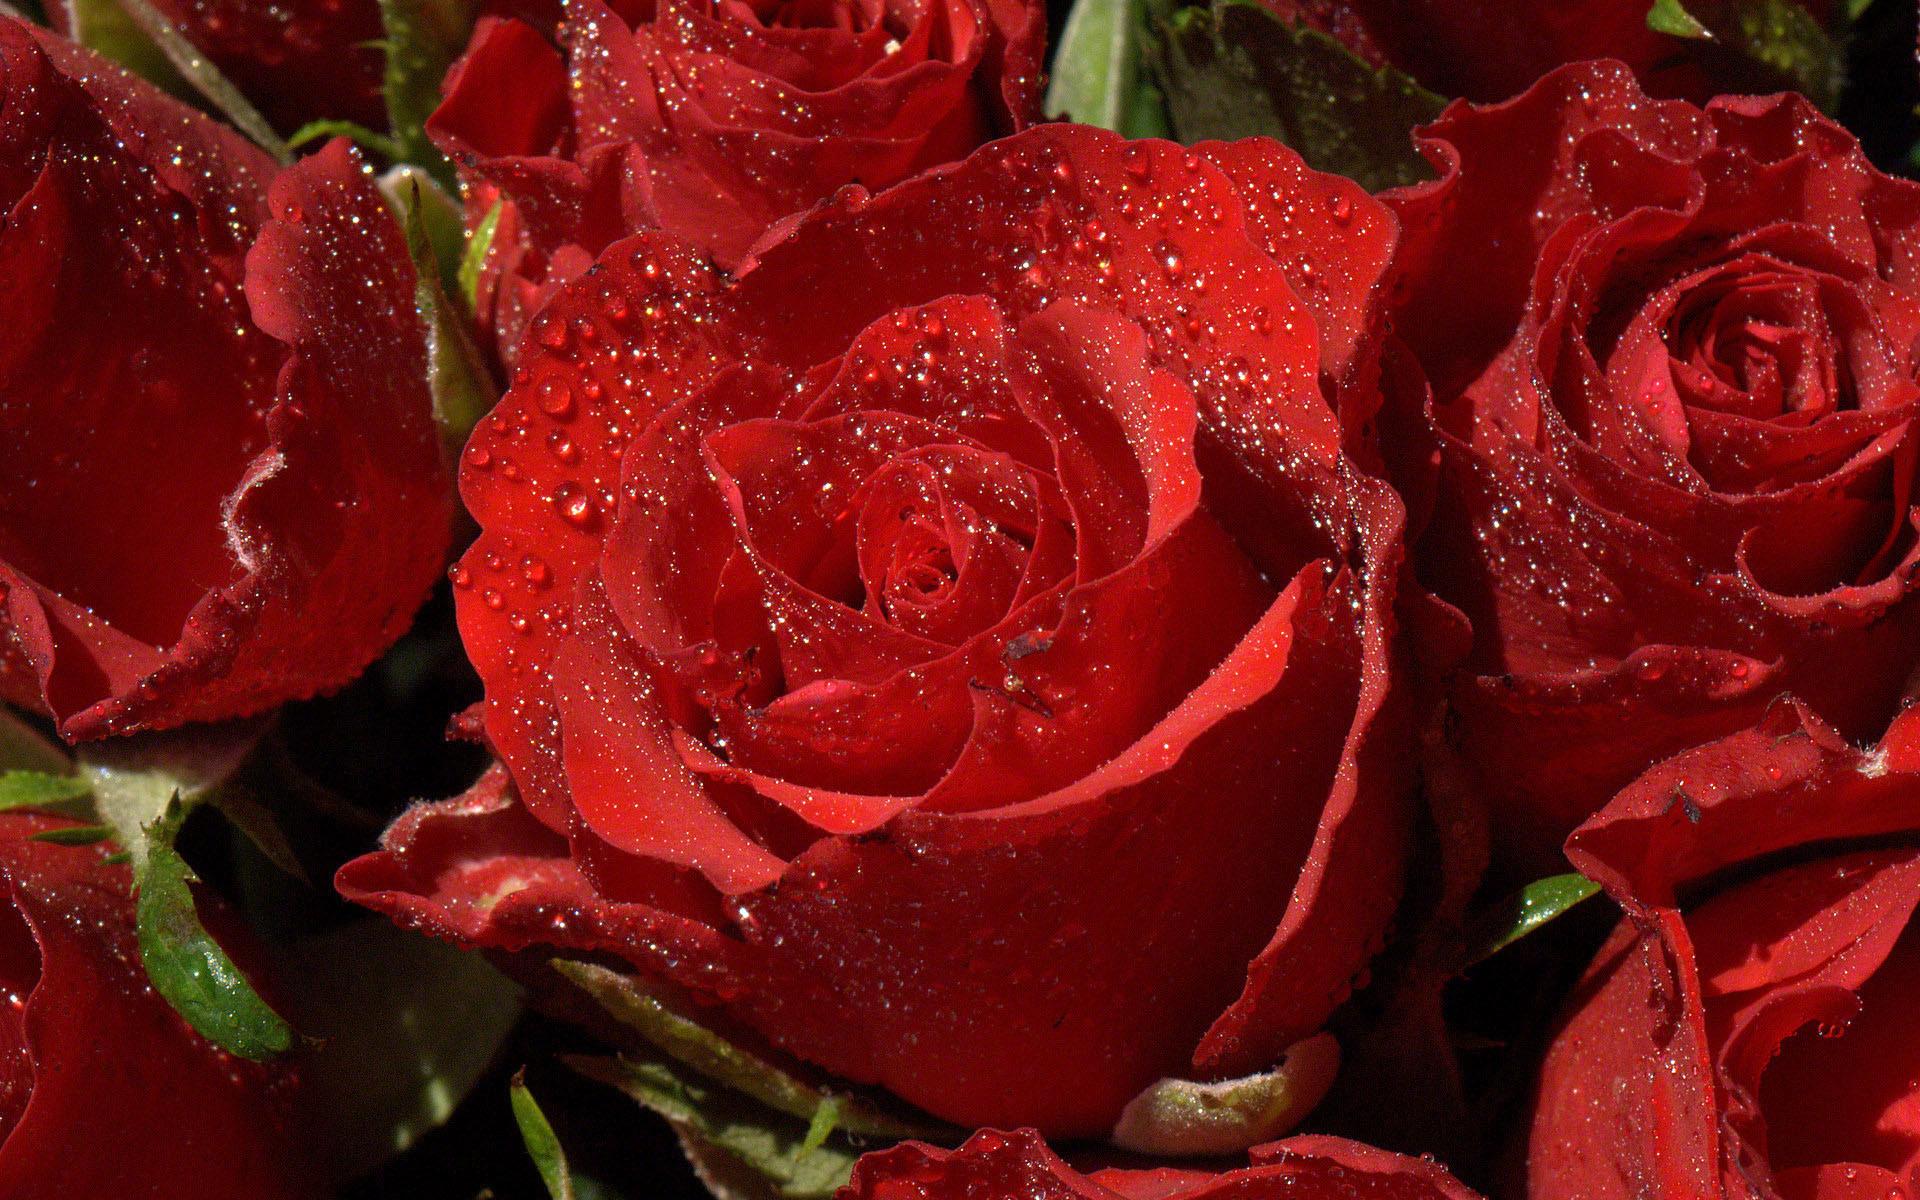 red rose waterdrops